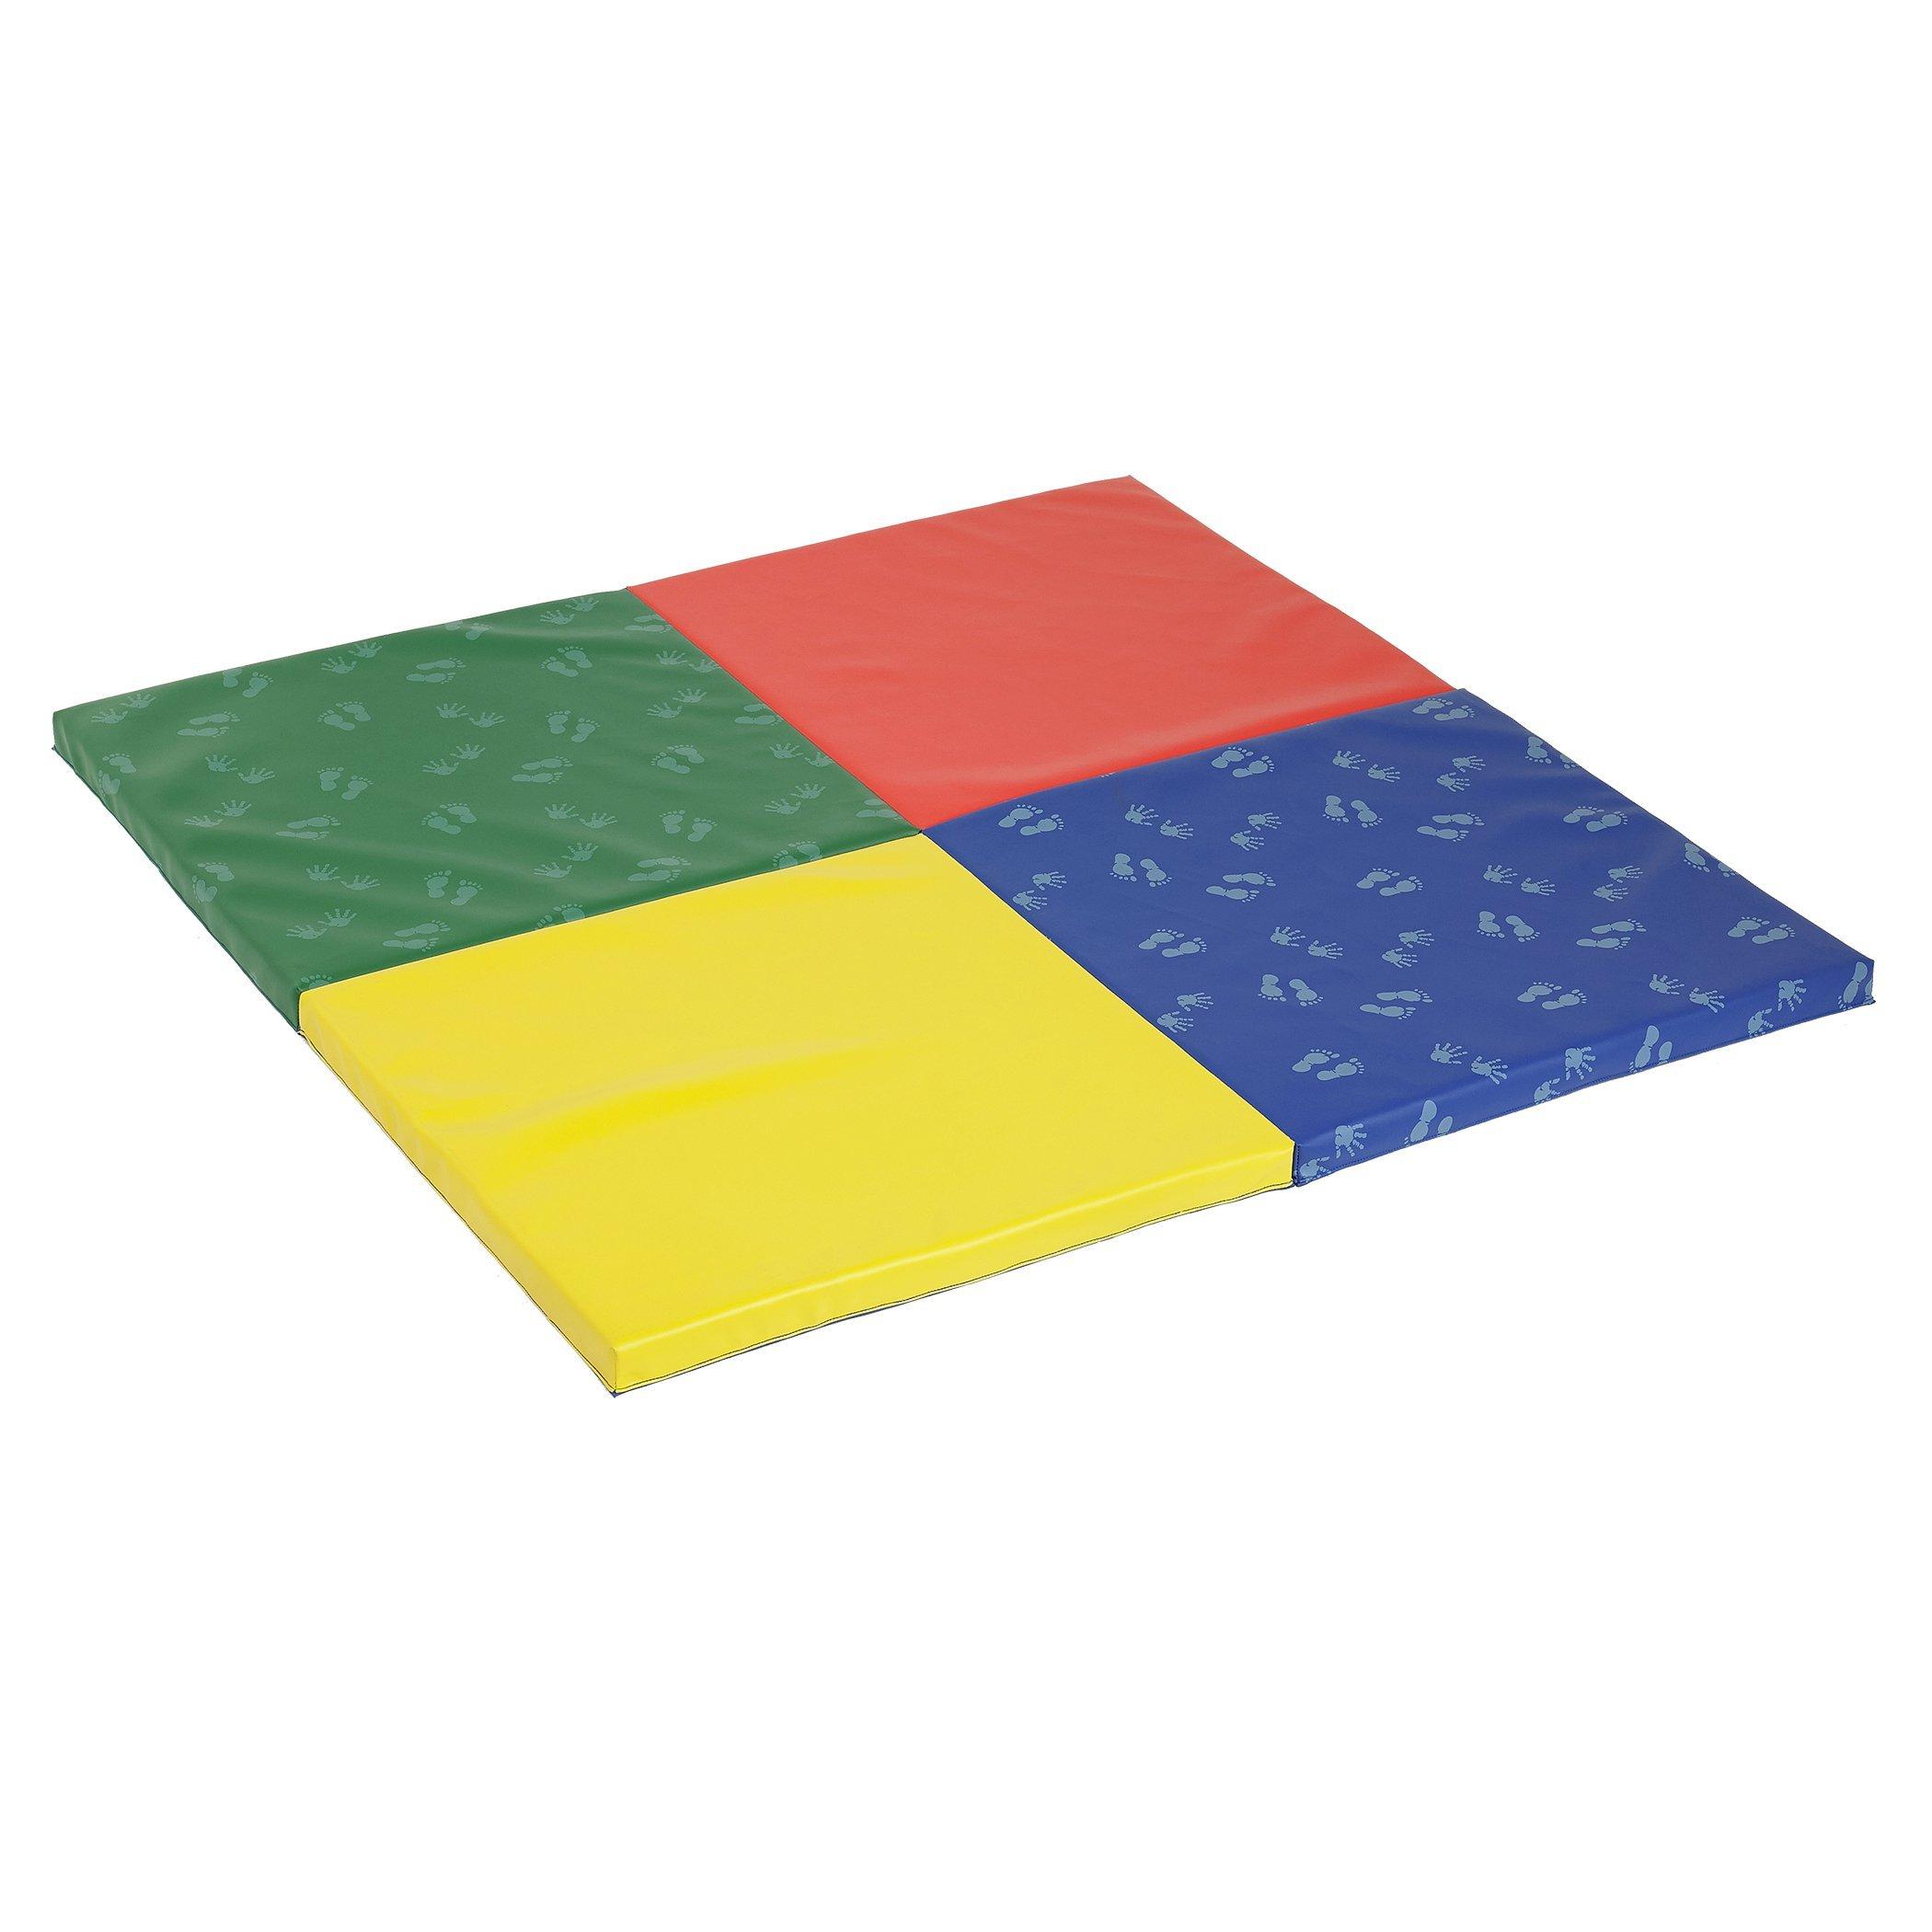 ECR4Kids SoftZone Hands and Feet Play Mat, 4-Fold, Assorted